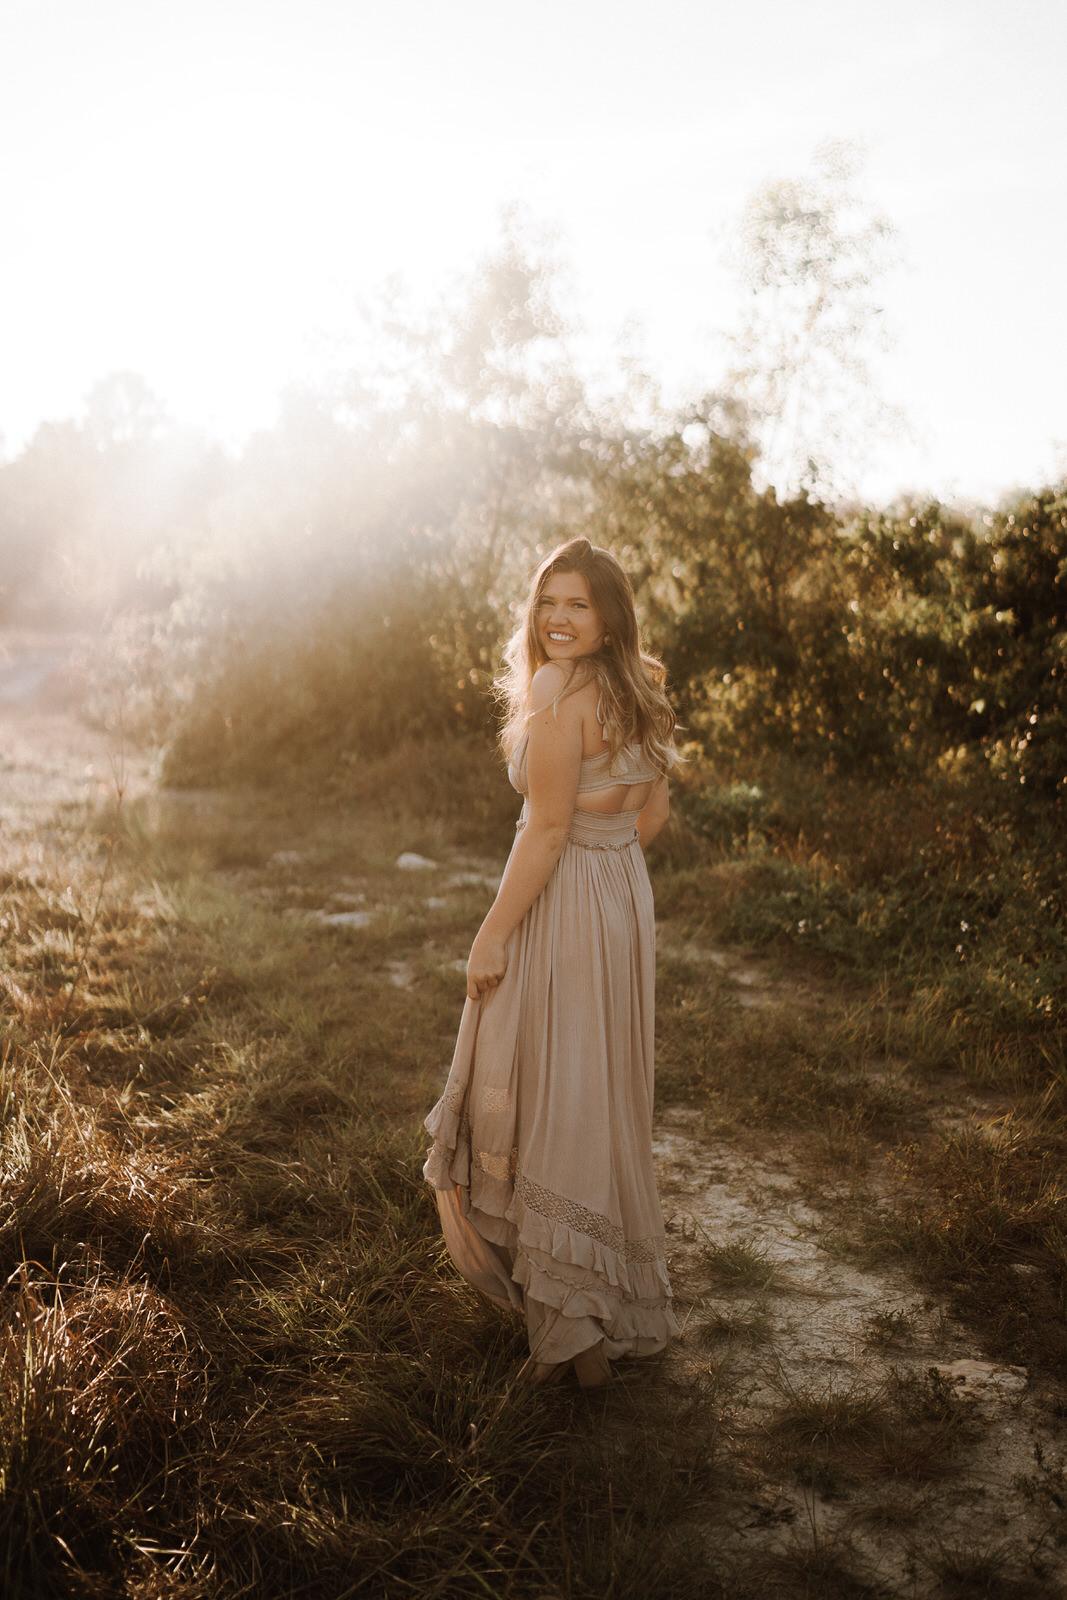 Fort Myers Senior Photos- Michelle Gonzalez Photography- Kristen Harder-29.JPG